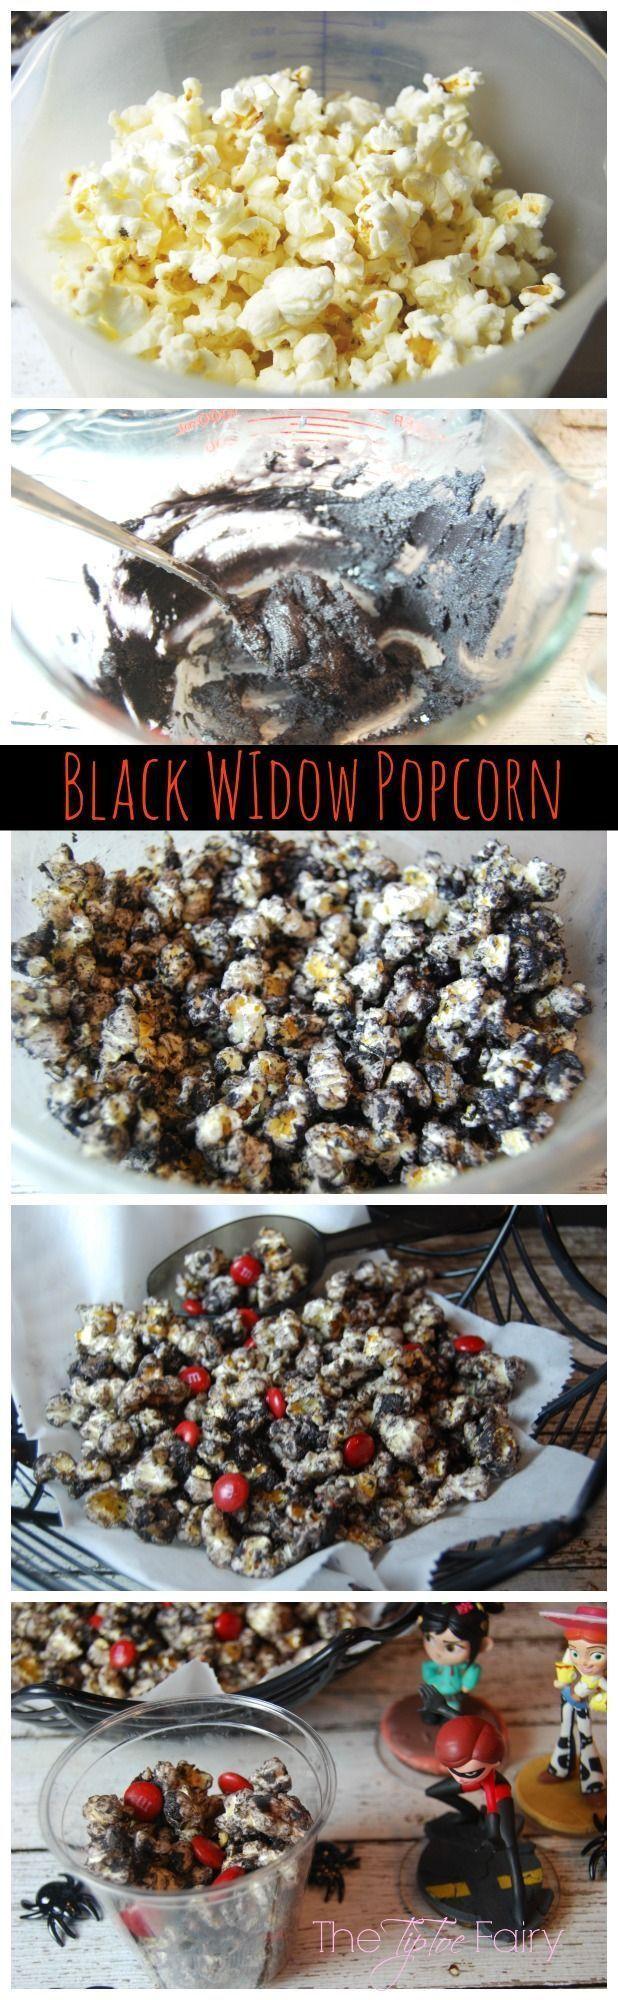 Popcorn Treat Black Widow Popcorn | The TipToe FairyBlack Widow Popcorn | The TipToe FairyWidow Popcorn Treat Black Widow Popcorn | The TipToe FairyBlack Widow Popcorn | The TipToe Fairy